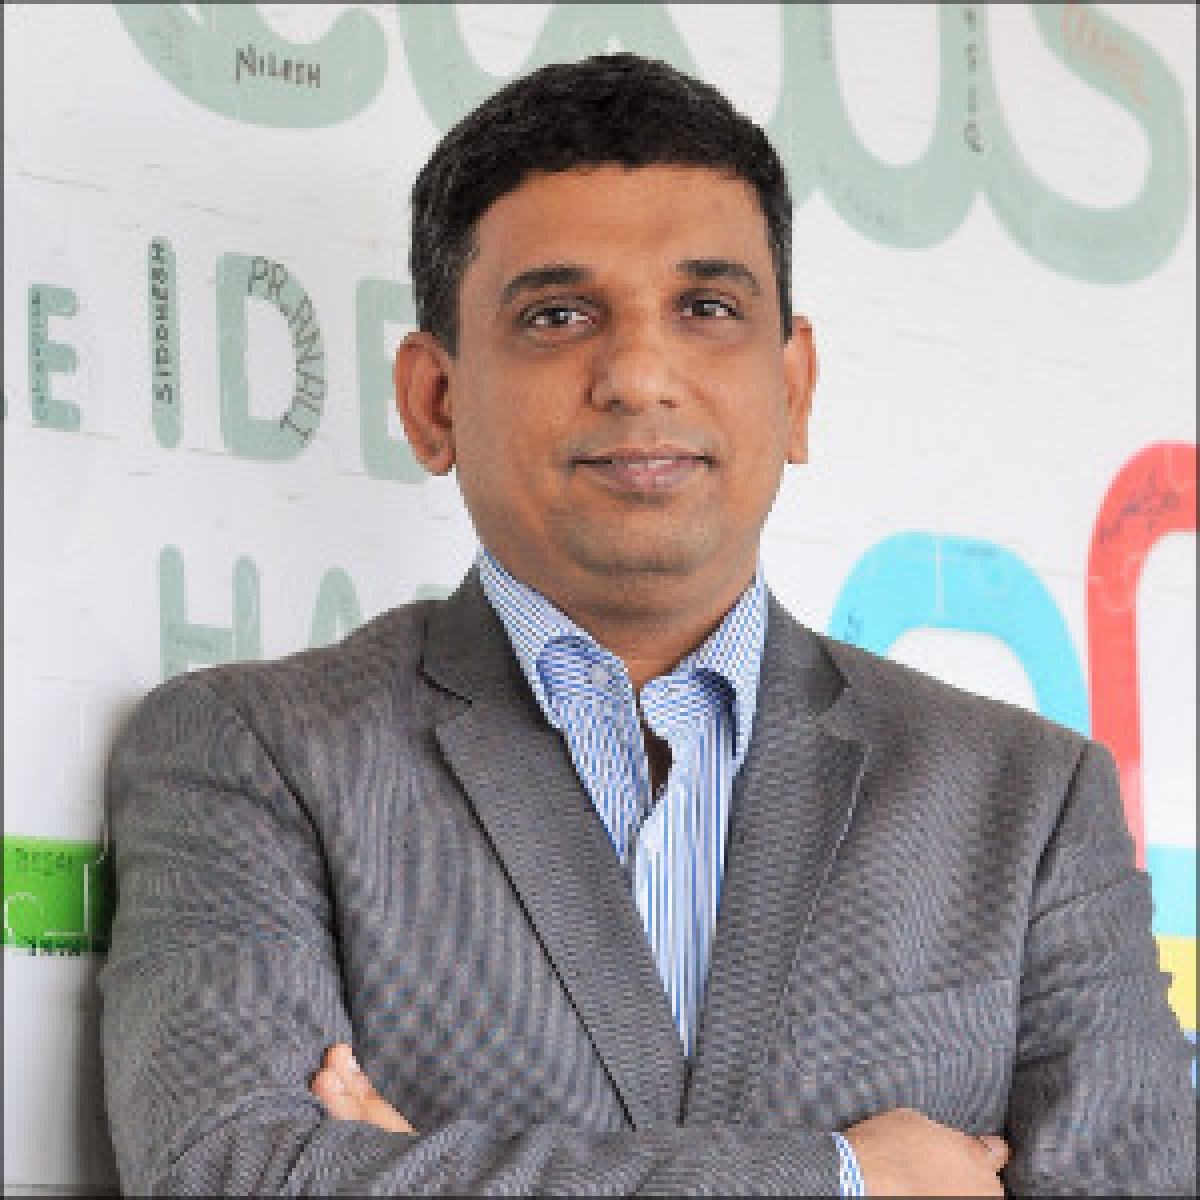 Perfetti Van Melle India retains Wavemaker India for media duties